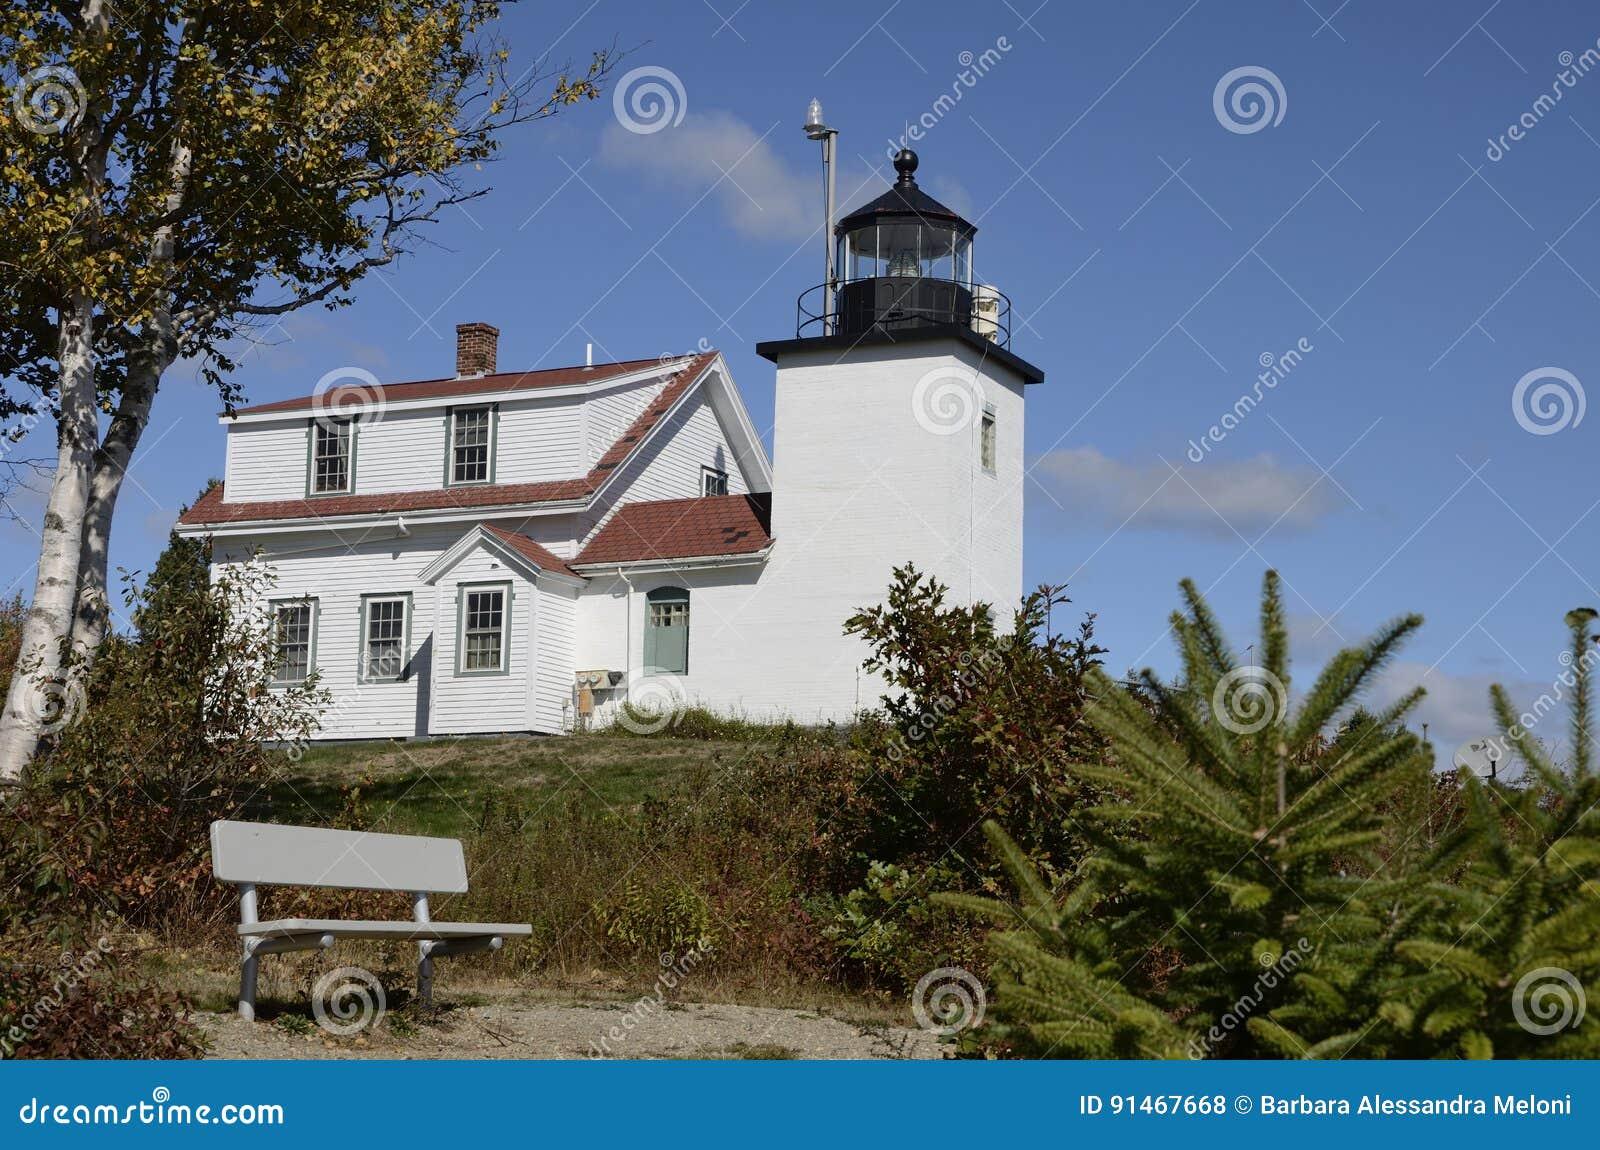 Fortu punktu latarnia morska, Nowa Anglia, Maine, Stany Zjednoczone